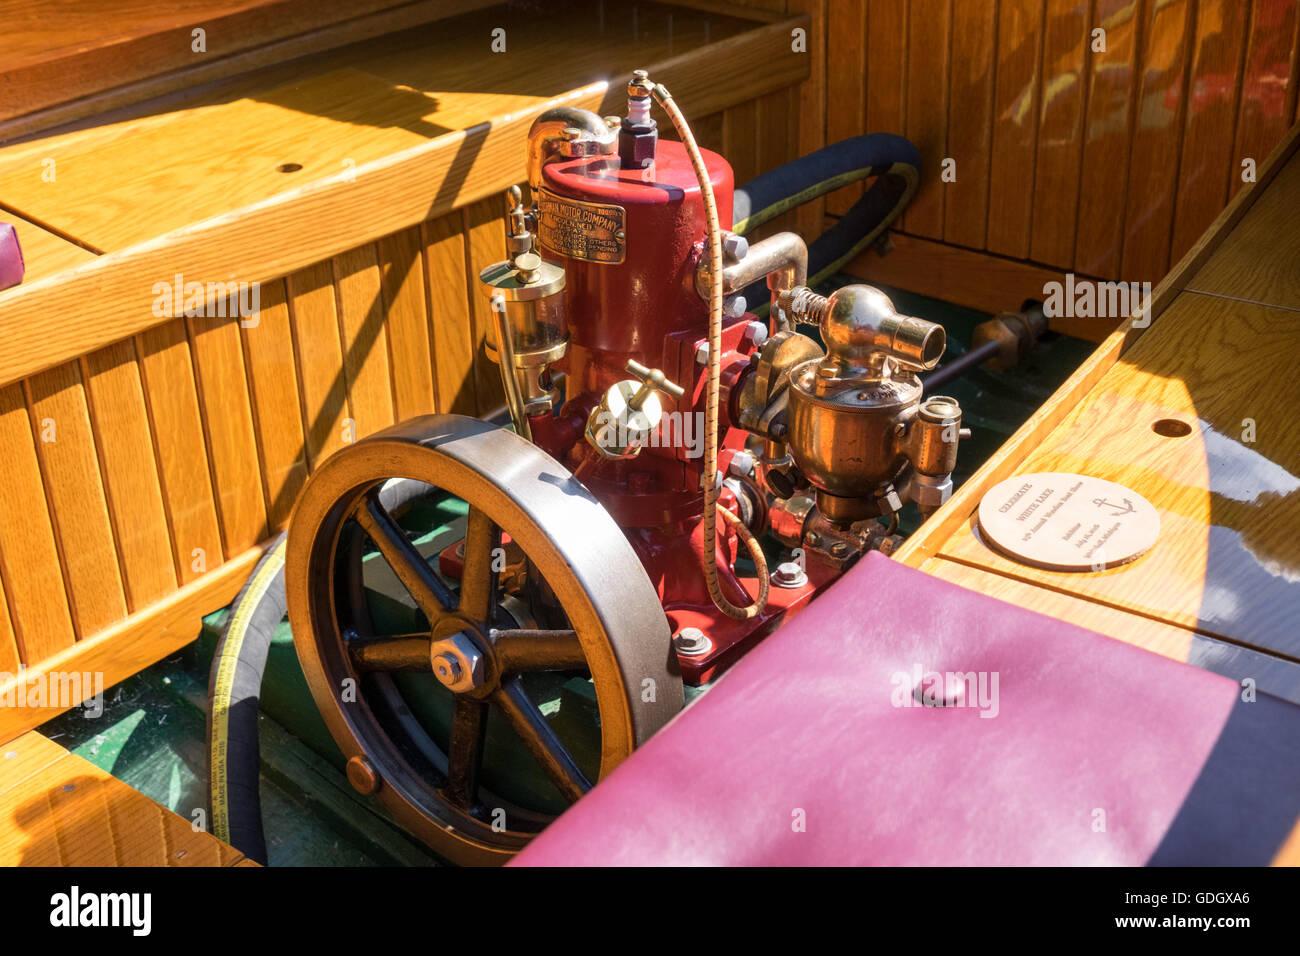 Cushman Motor Company marine engine mounted in an antique